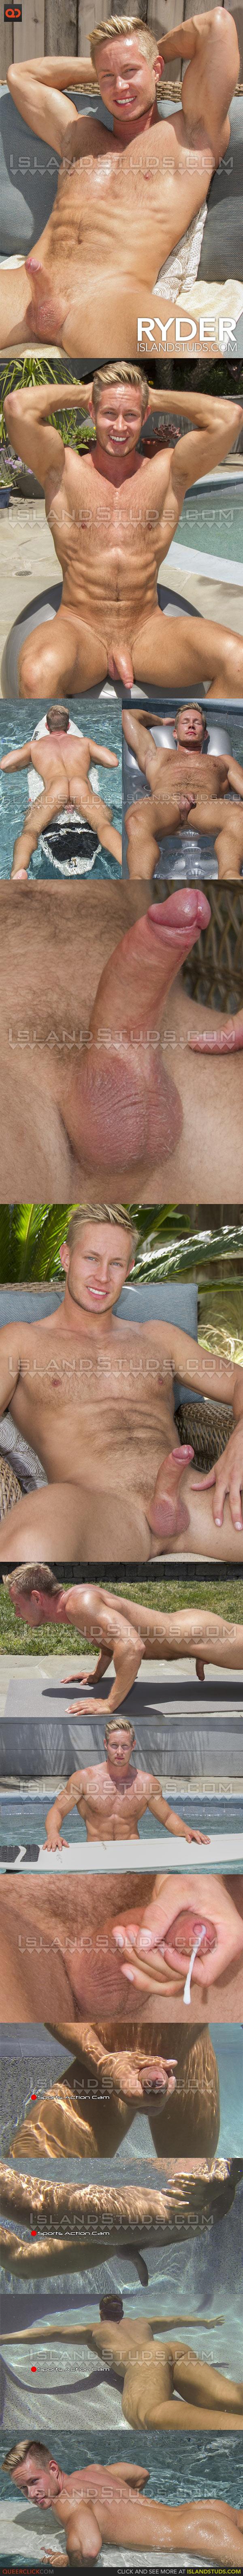 Island Studs: Ryder